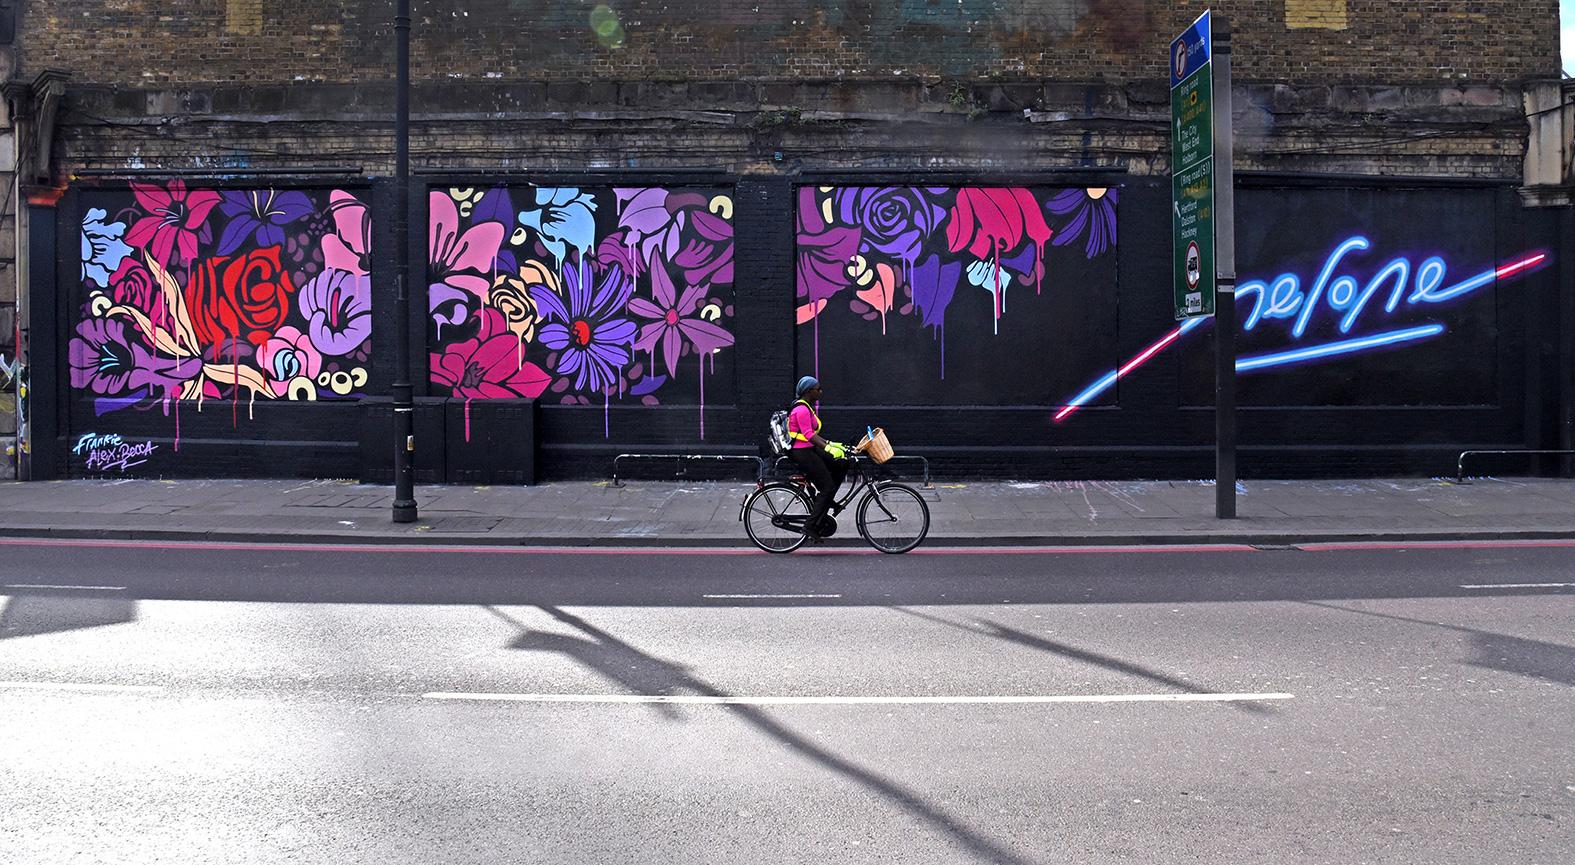 Nerone-street-art-london-15